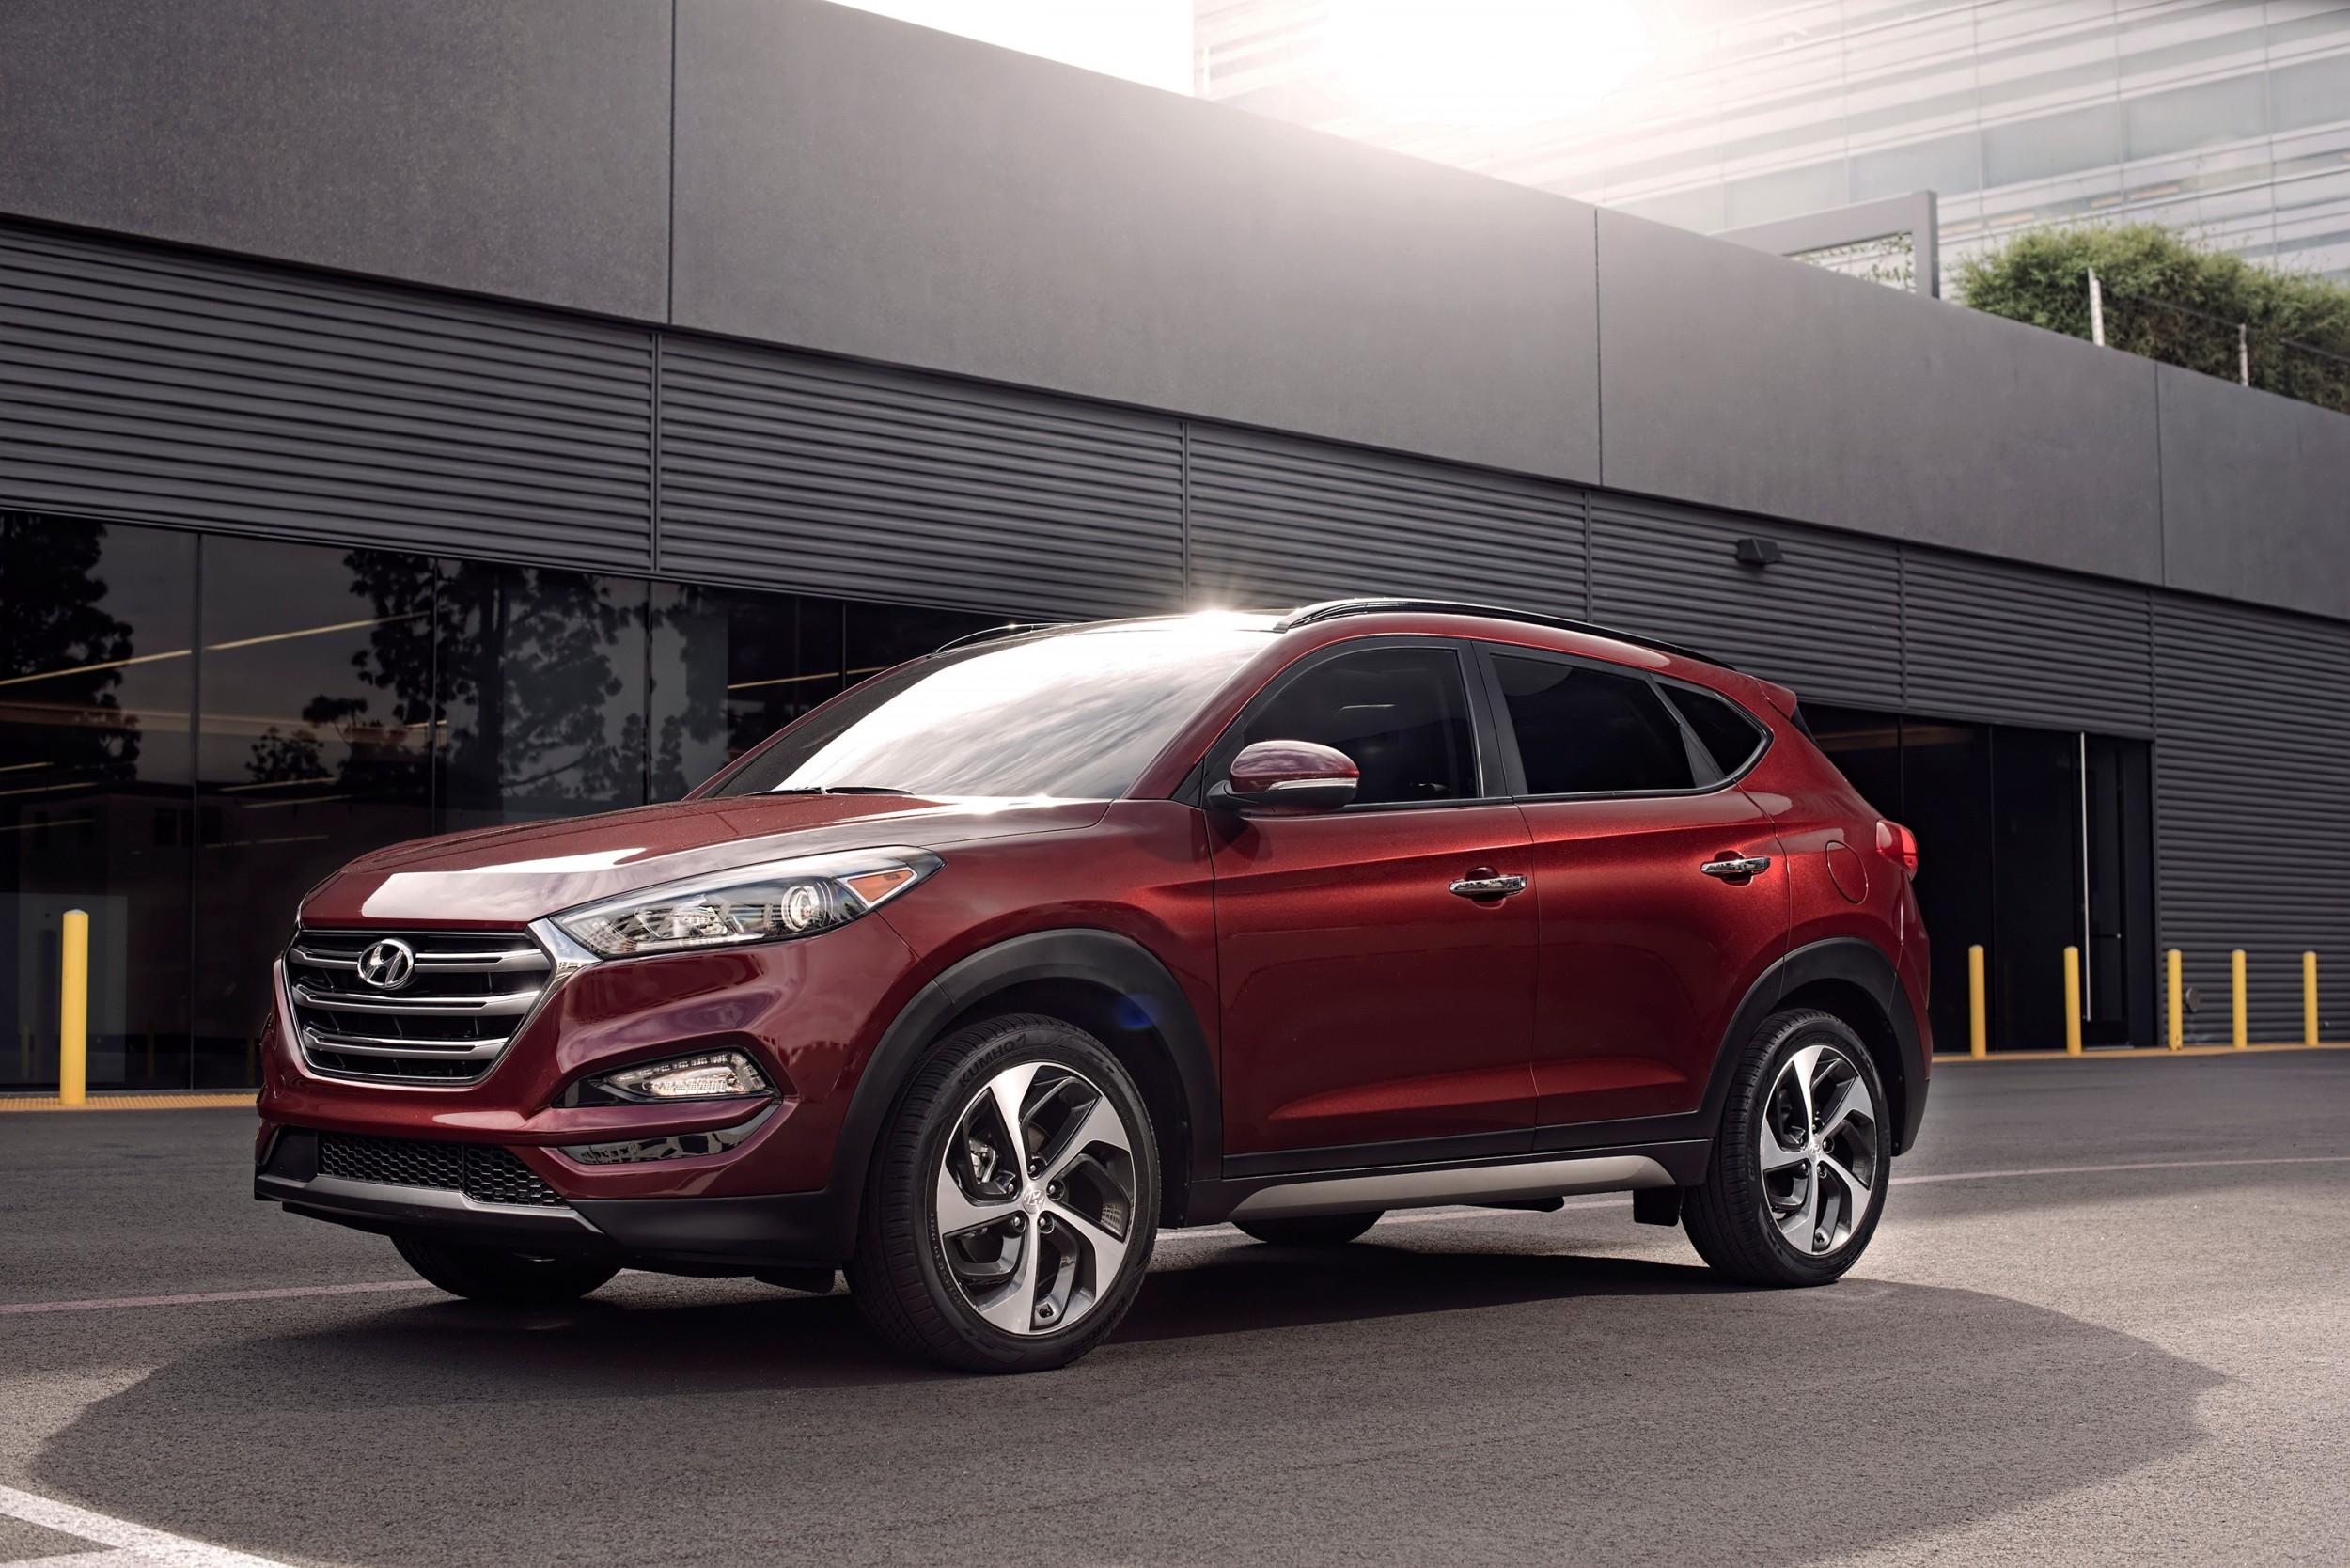 Hyundai Releases Prices for new 2016 Tucson • AutoTalk